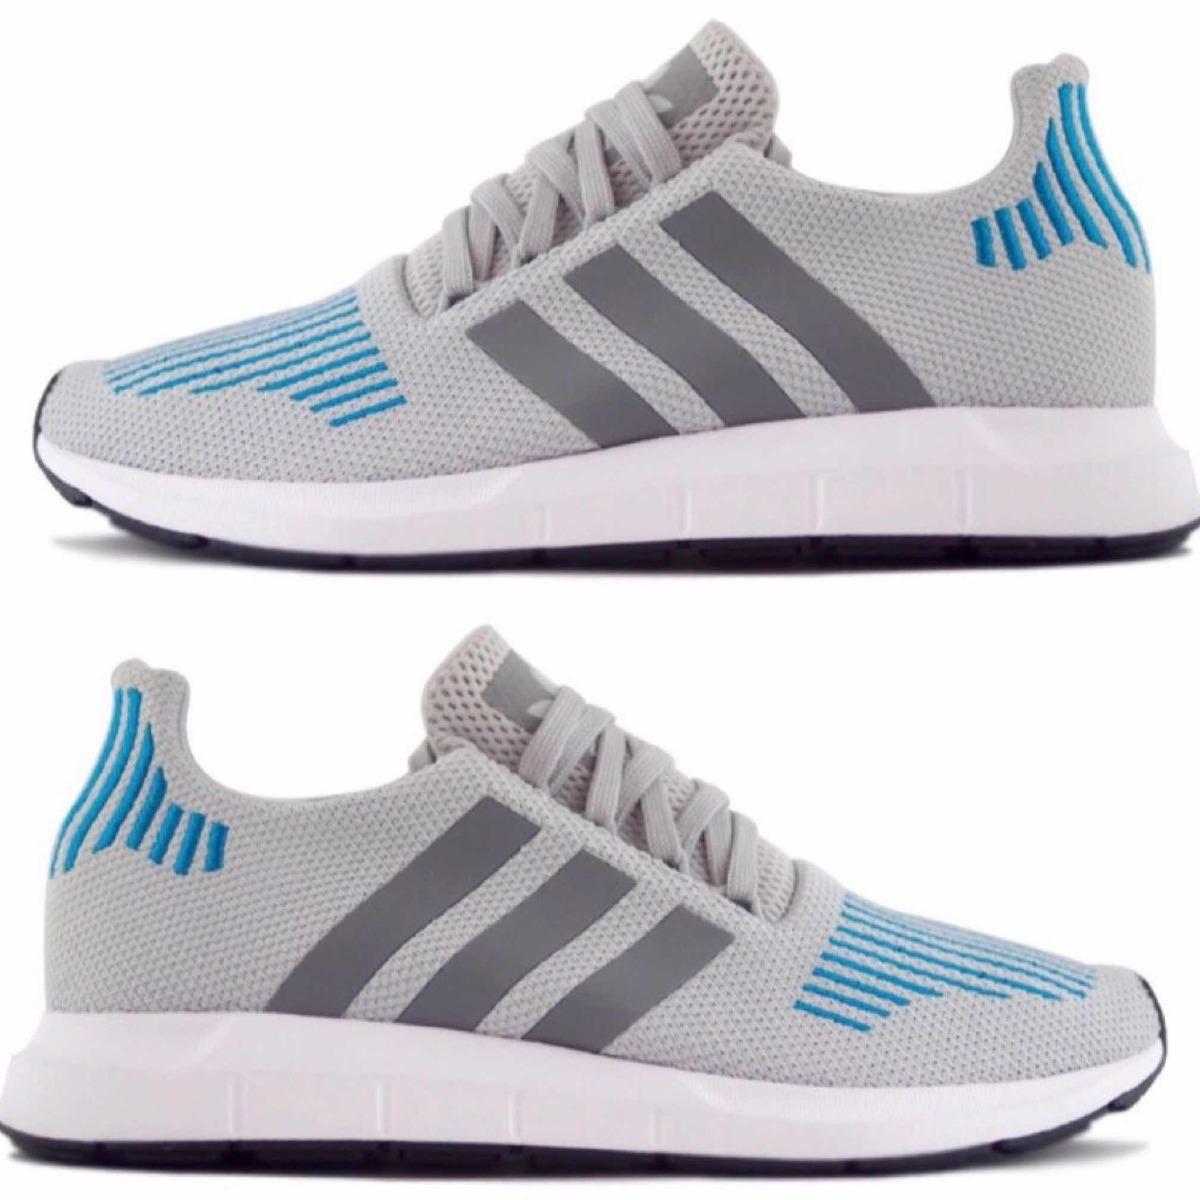 b590c65850 tenis adidas swift run gris azul  8   incluye caja original. Cargando zoom.